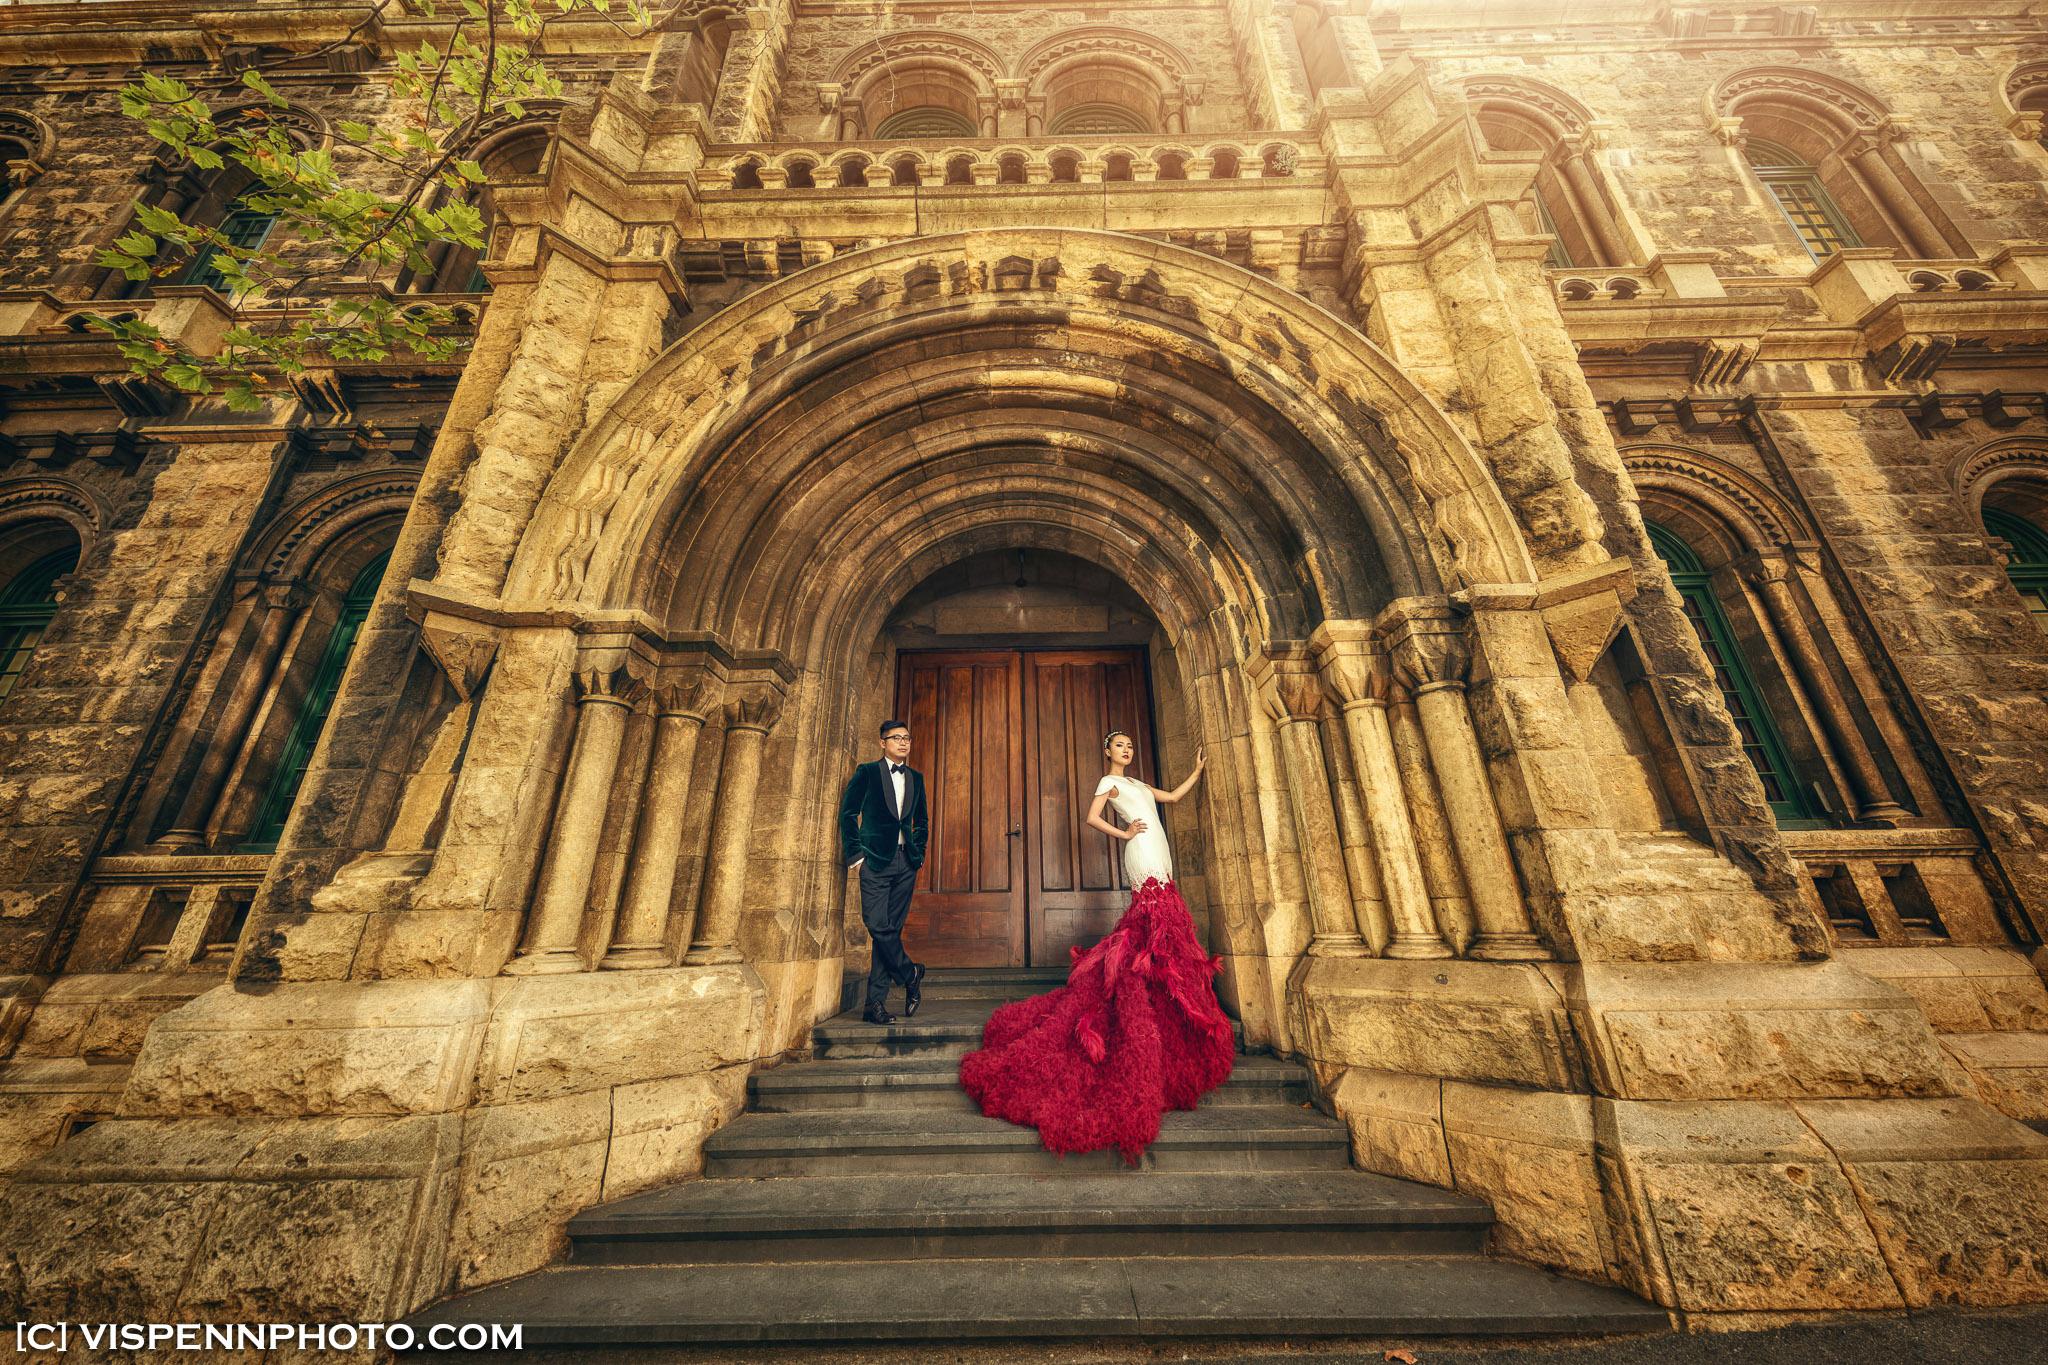 PRE WEDDING Photography Melbourne VISPENN 墨尔本 婚纱照 结婚照 婚纱摄影 VISPENN StacieYi PreWedding 5993 1